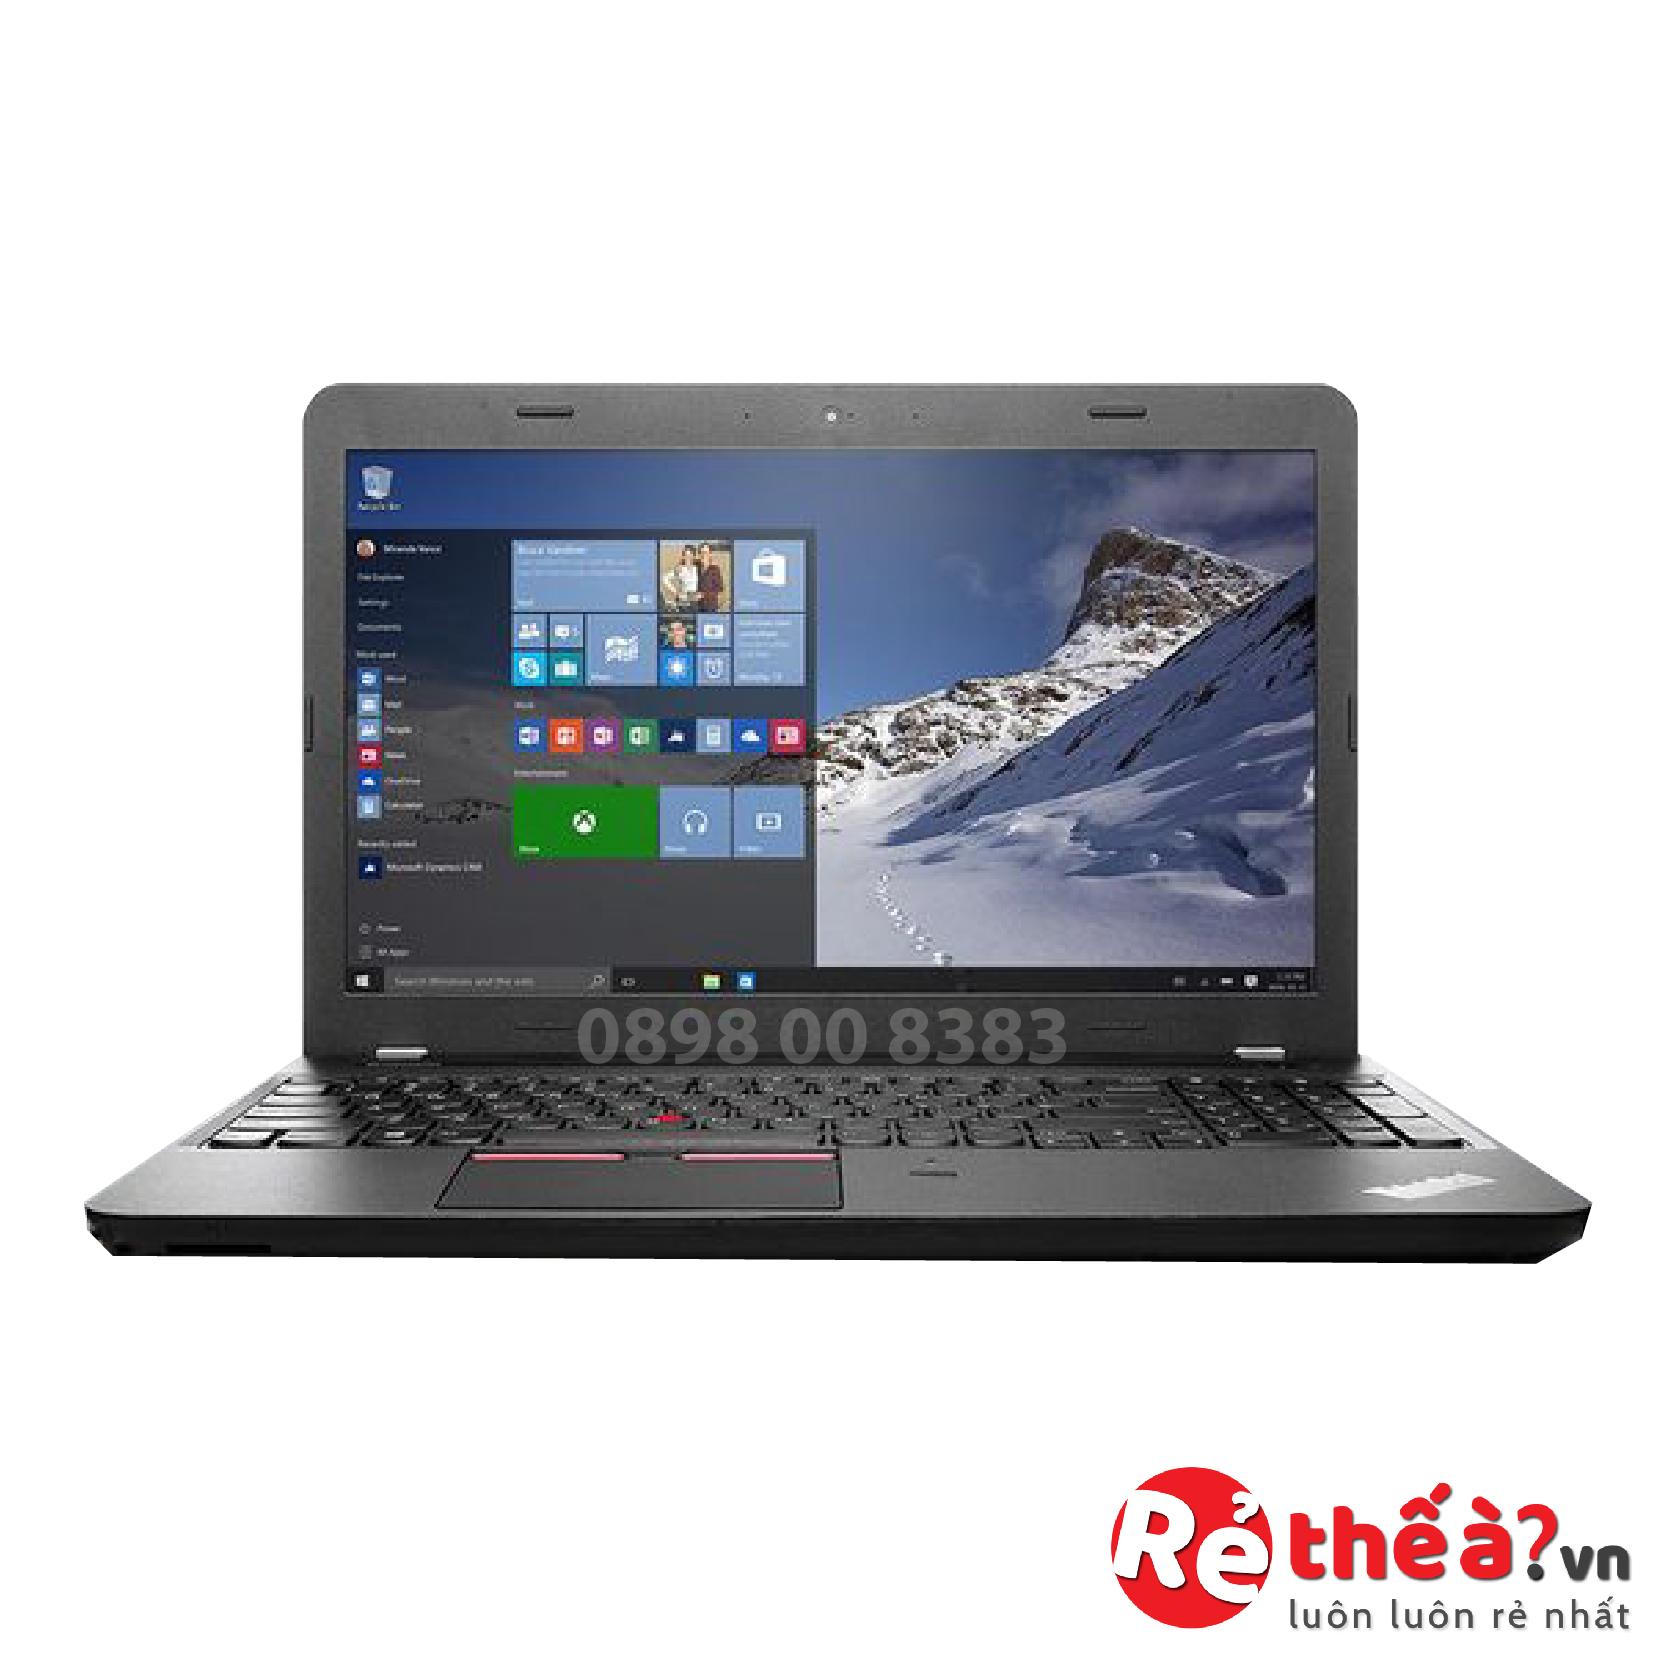 Laptop Lenovo Thinkpad E560